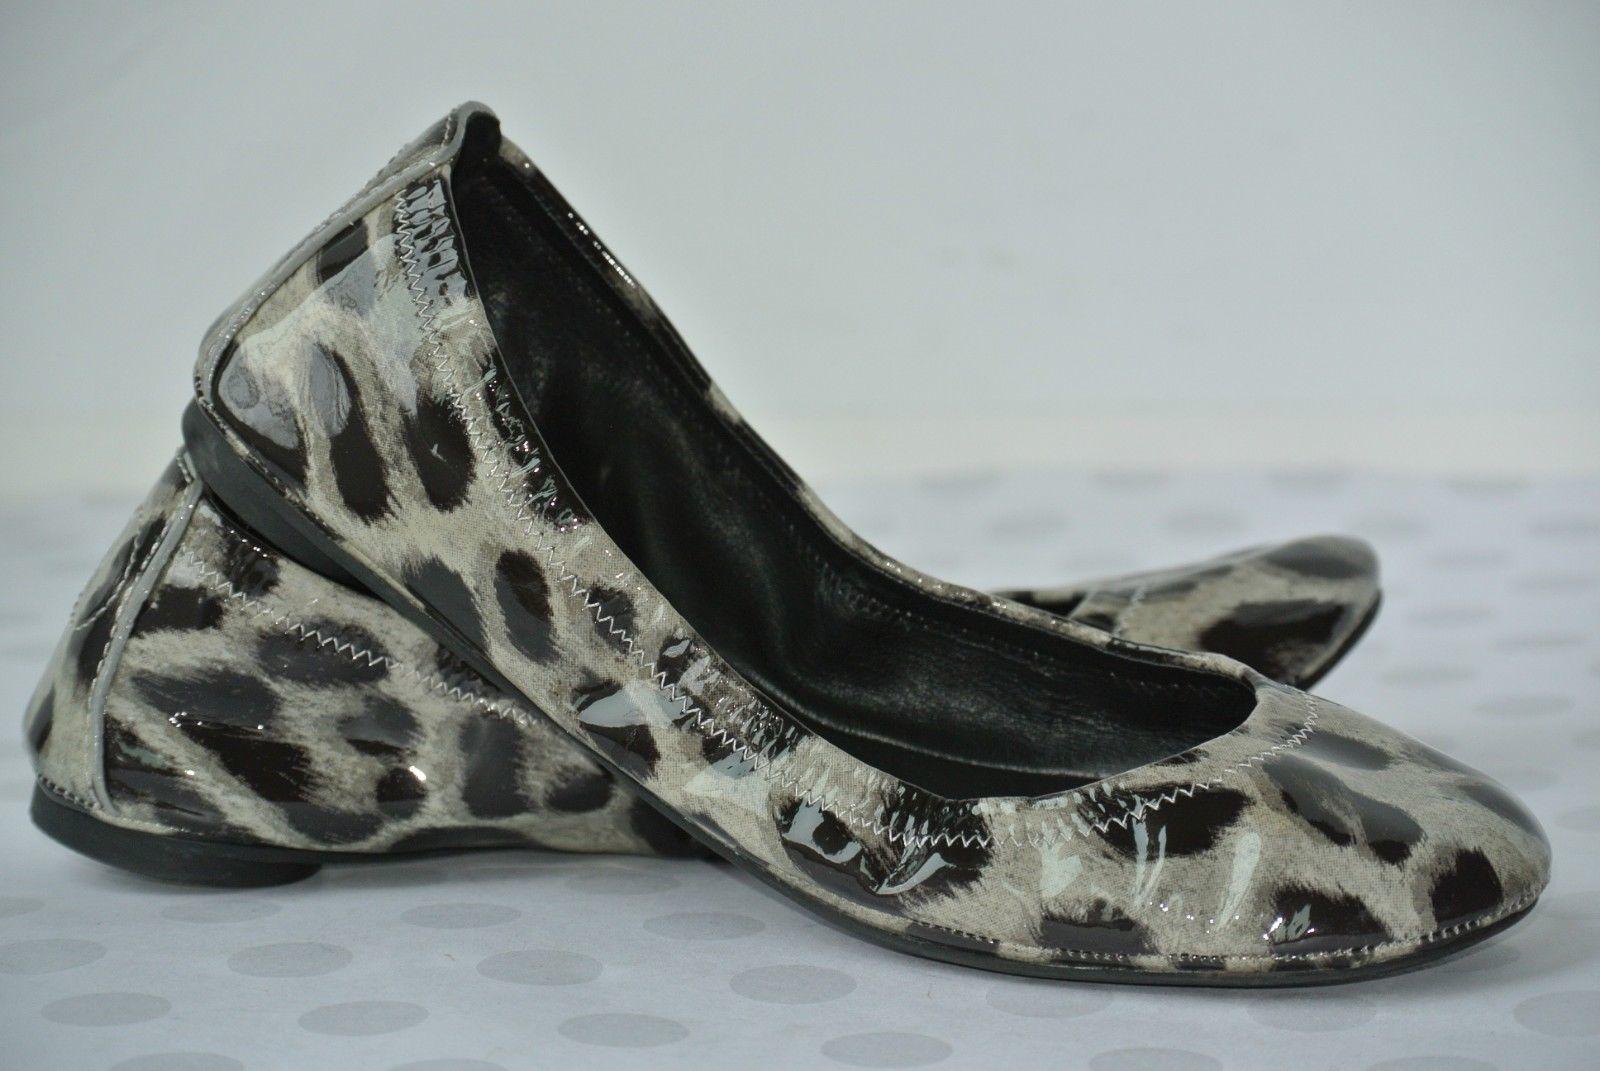 Tory Burch Eddie Womens Sz 5.5 M Patent Leather Animal Print Ballet Flats NICE!